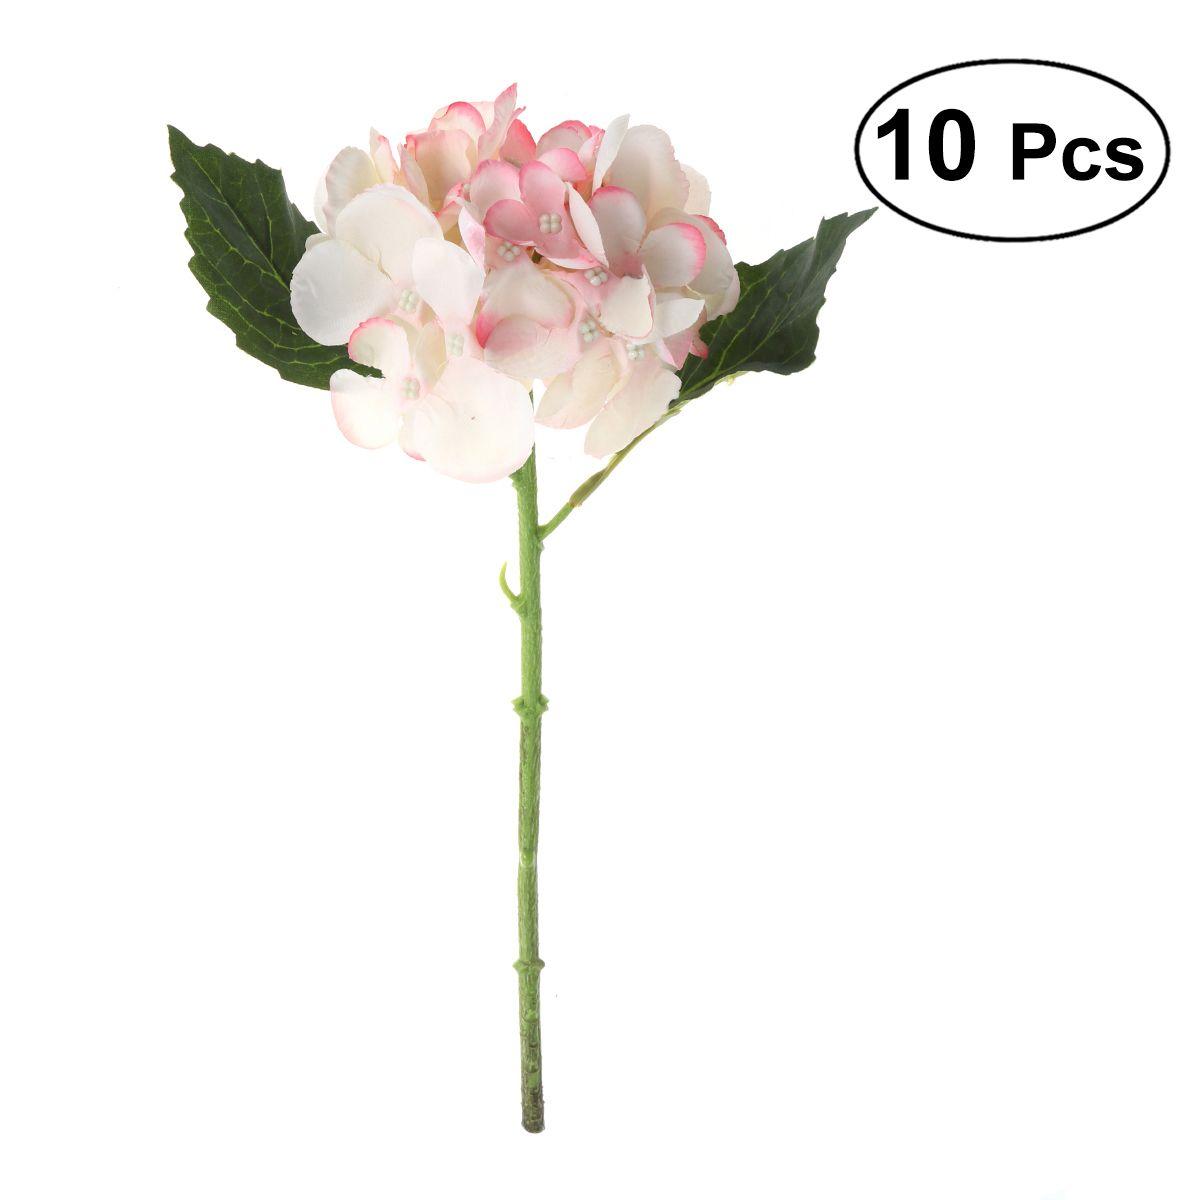 Flower Bunches Bouquet Artificial Silk Single Stem Fake Plants